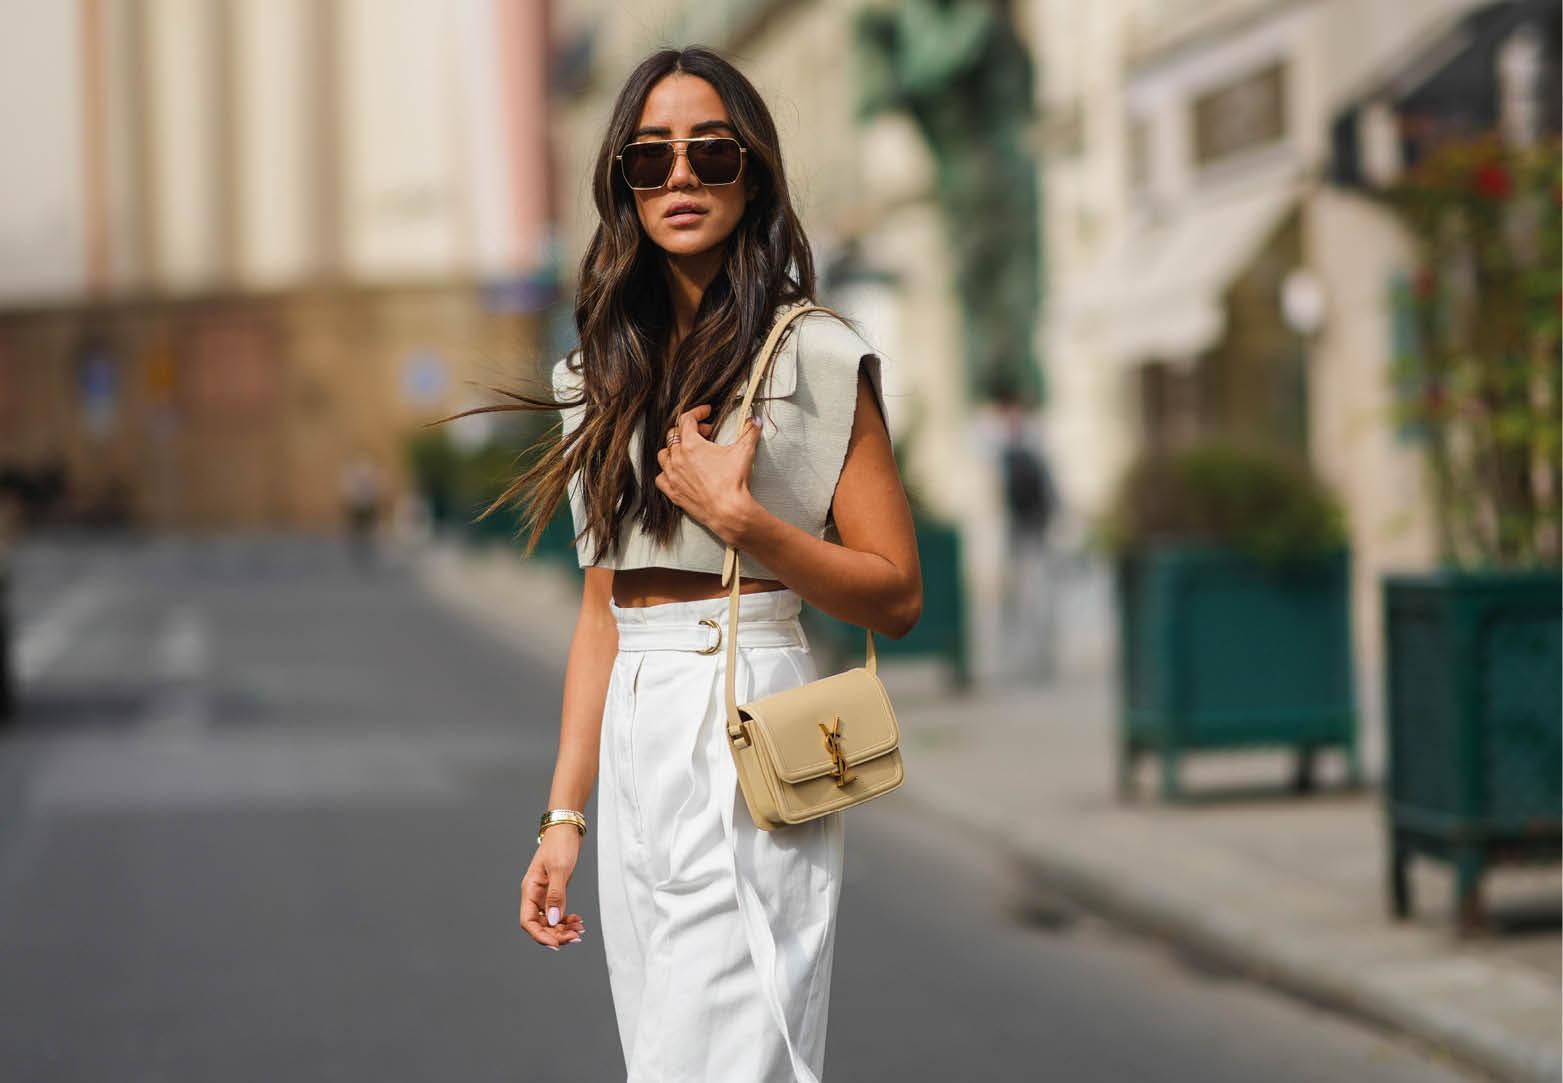 Makkelijke zomer outfits